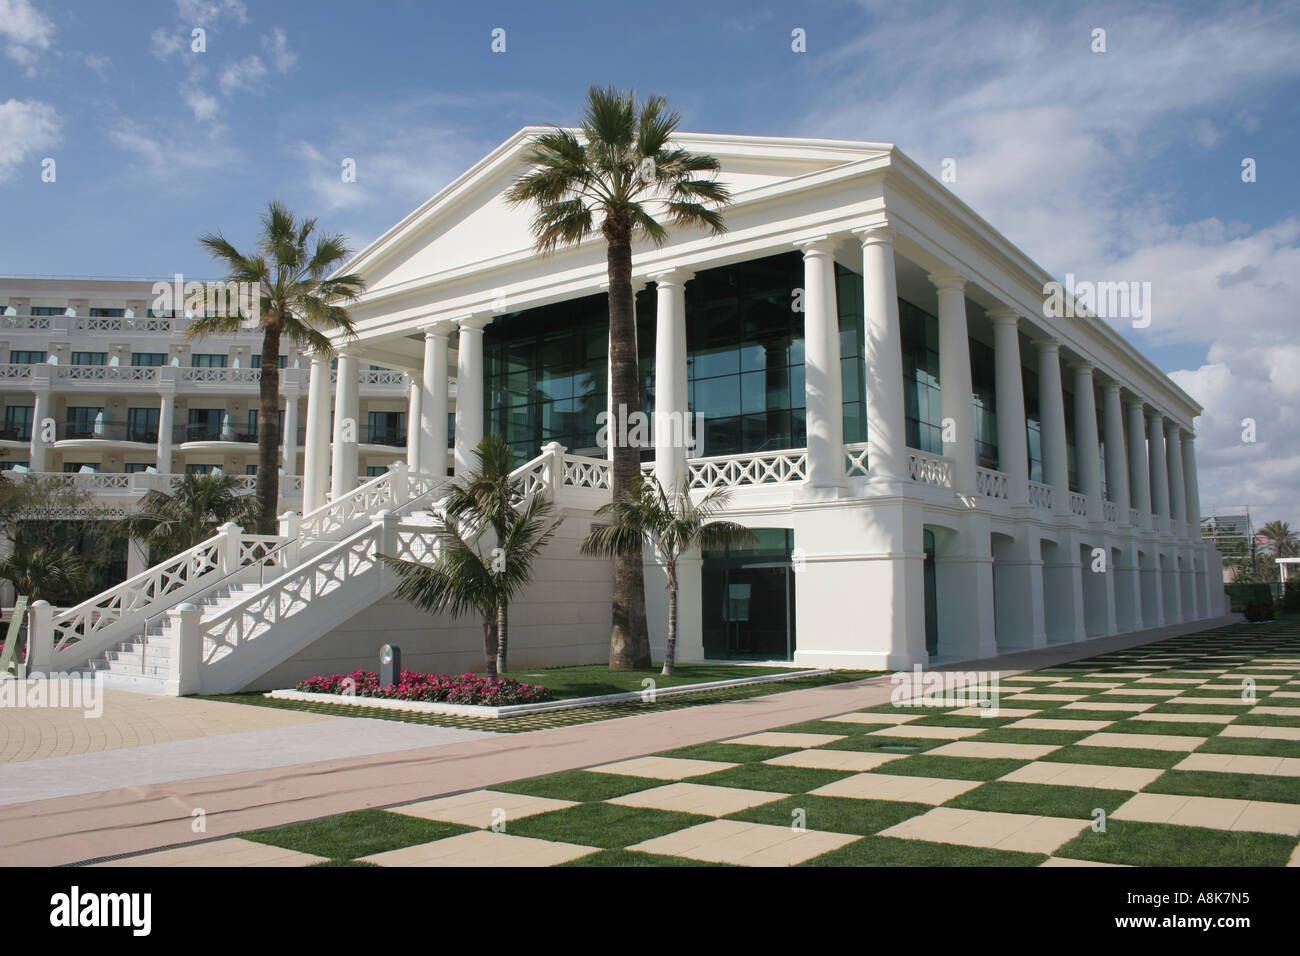 Hotel las arenas playa de la malvarrosa valencia spain stock photo 6927508 alamy - Hoteles en la playa de la malvarrosa ...